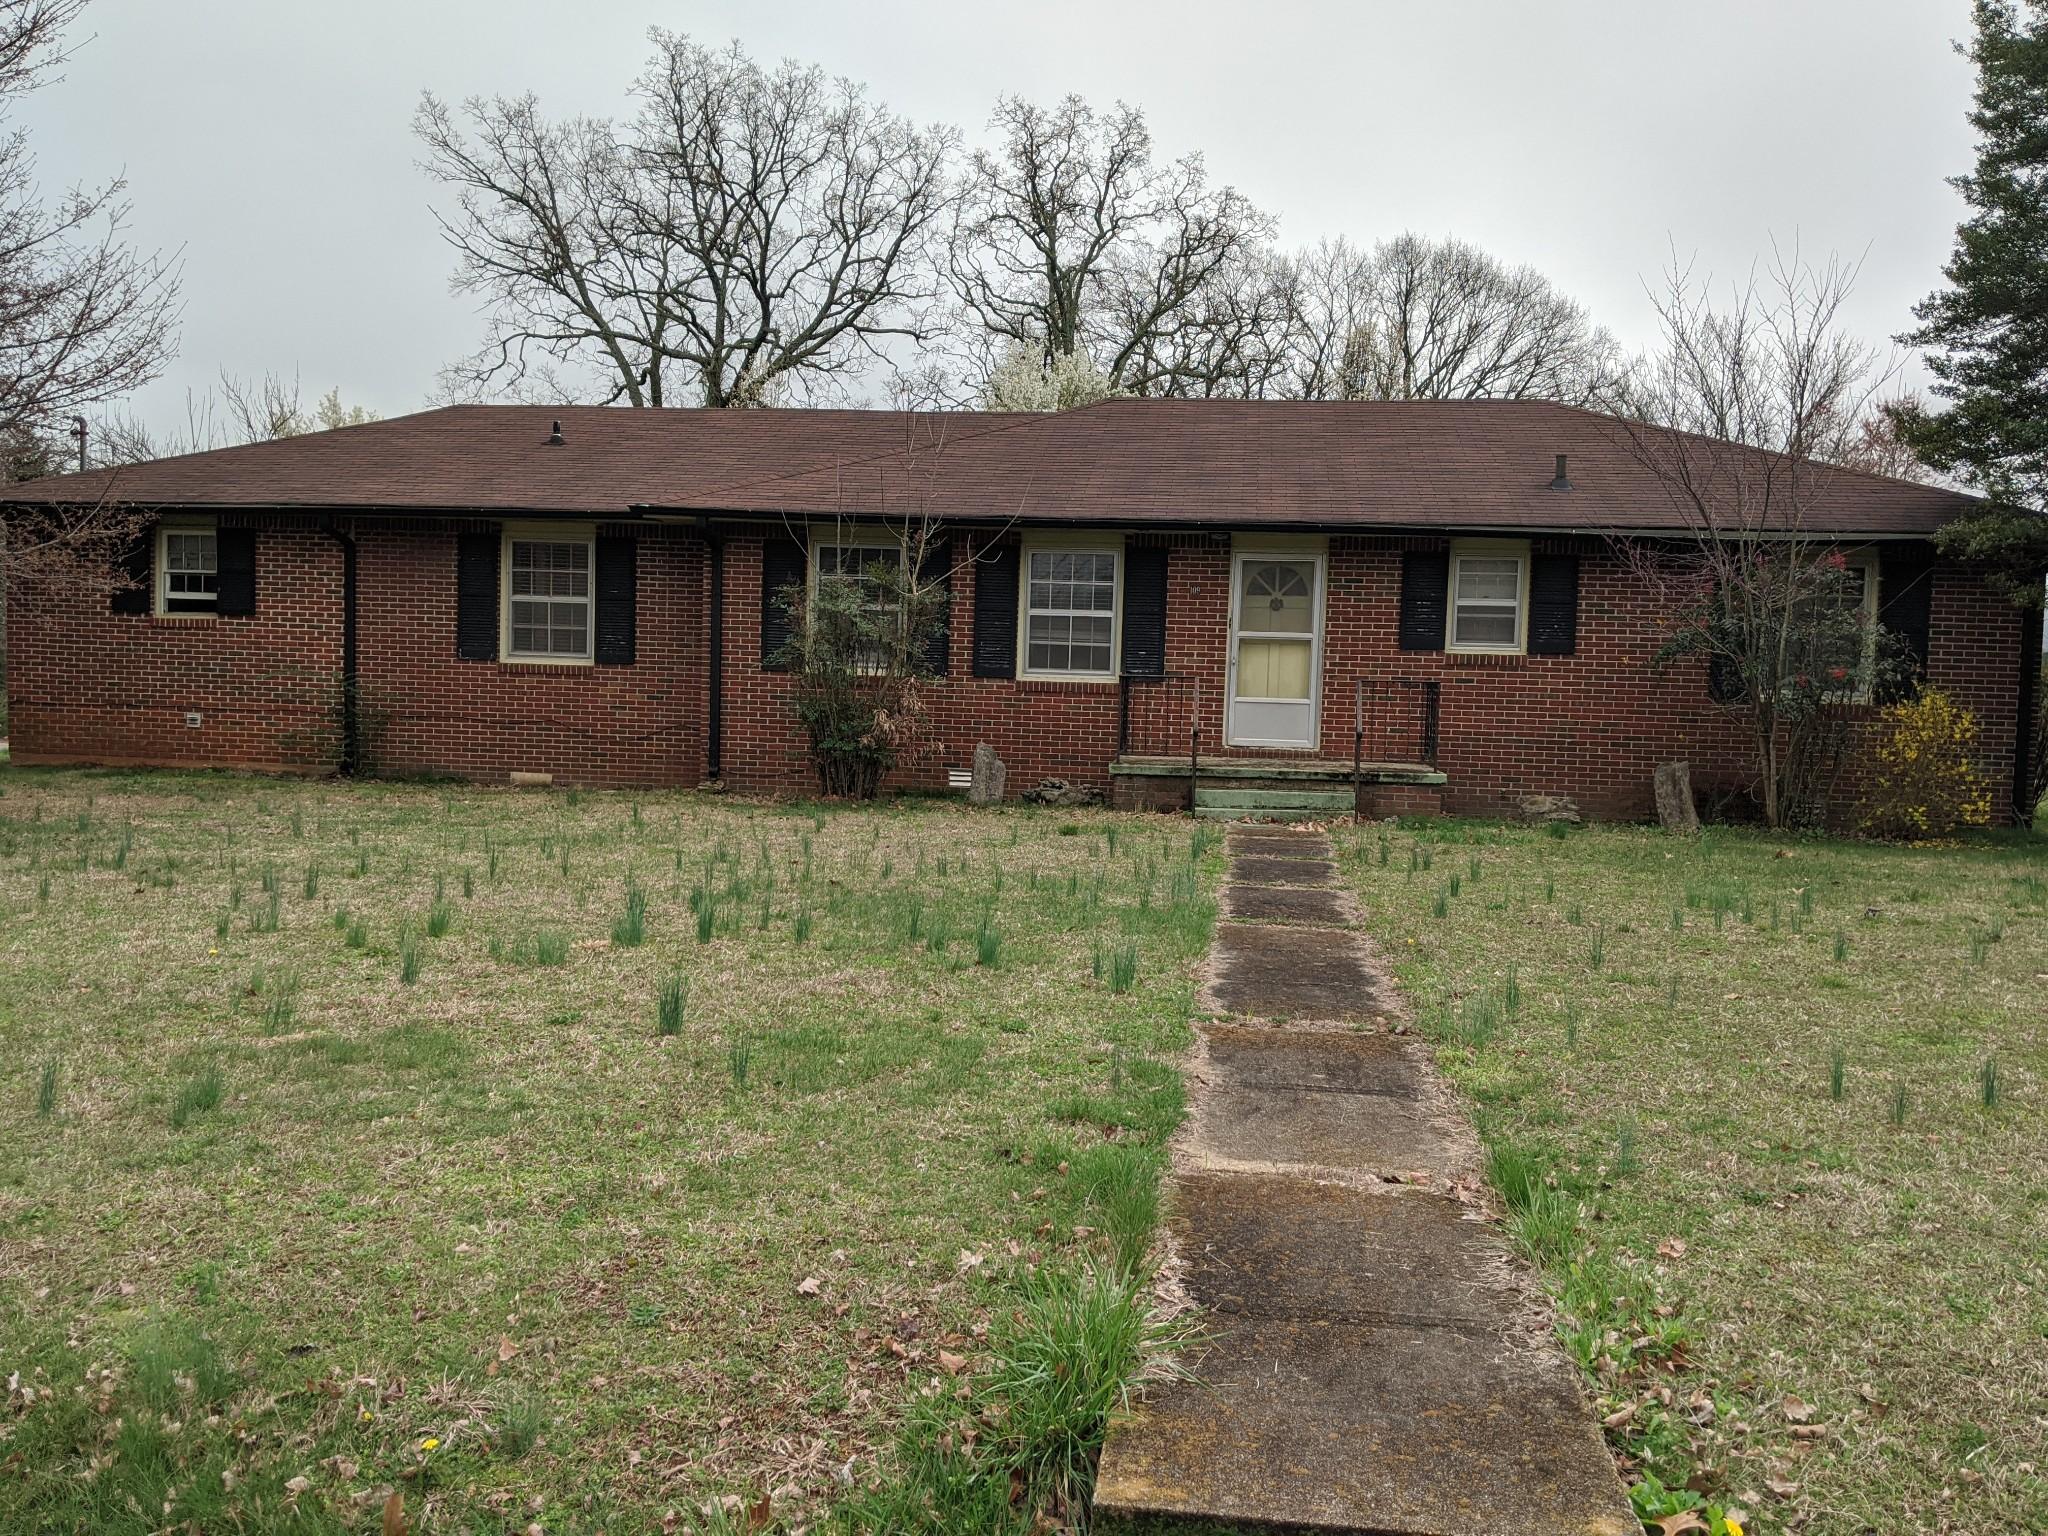 109 Woodland Dr, Decherd, TN 37324 - Decherd, TN real estate listing